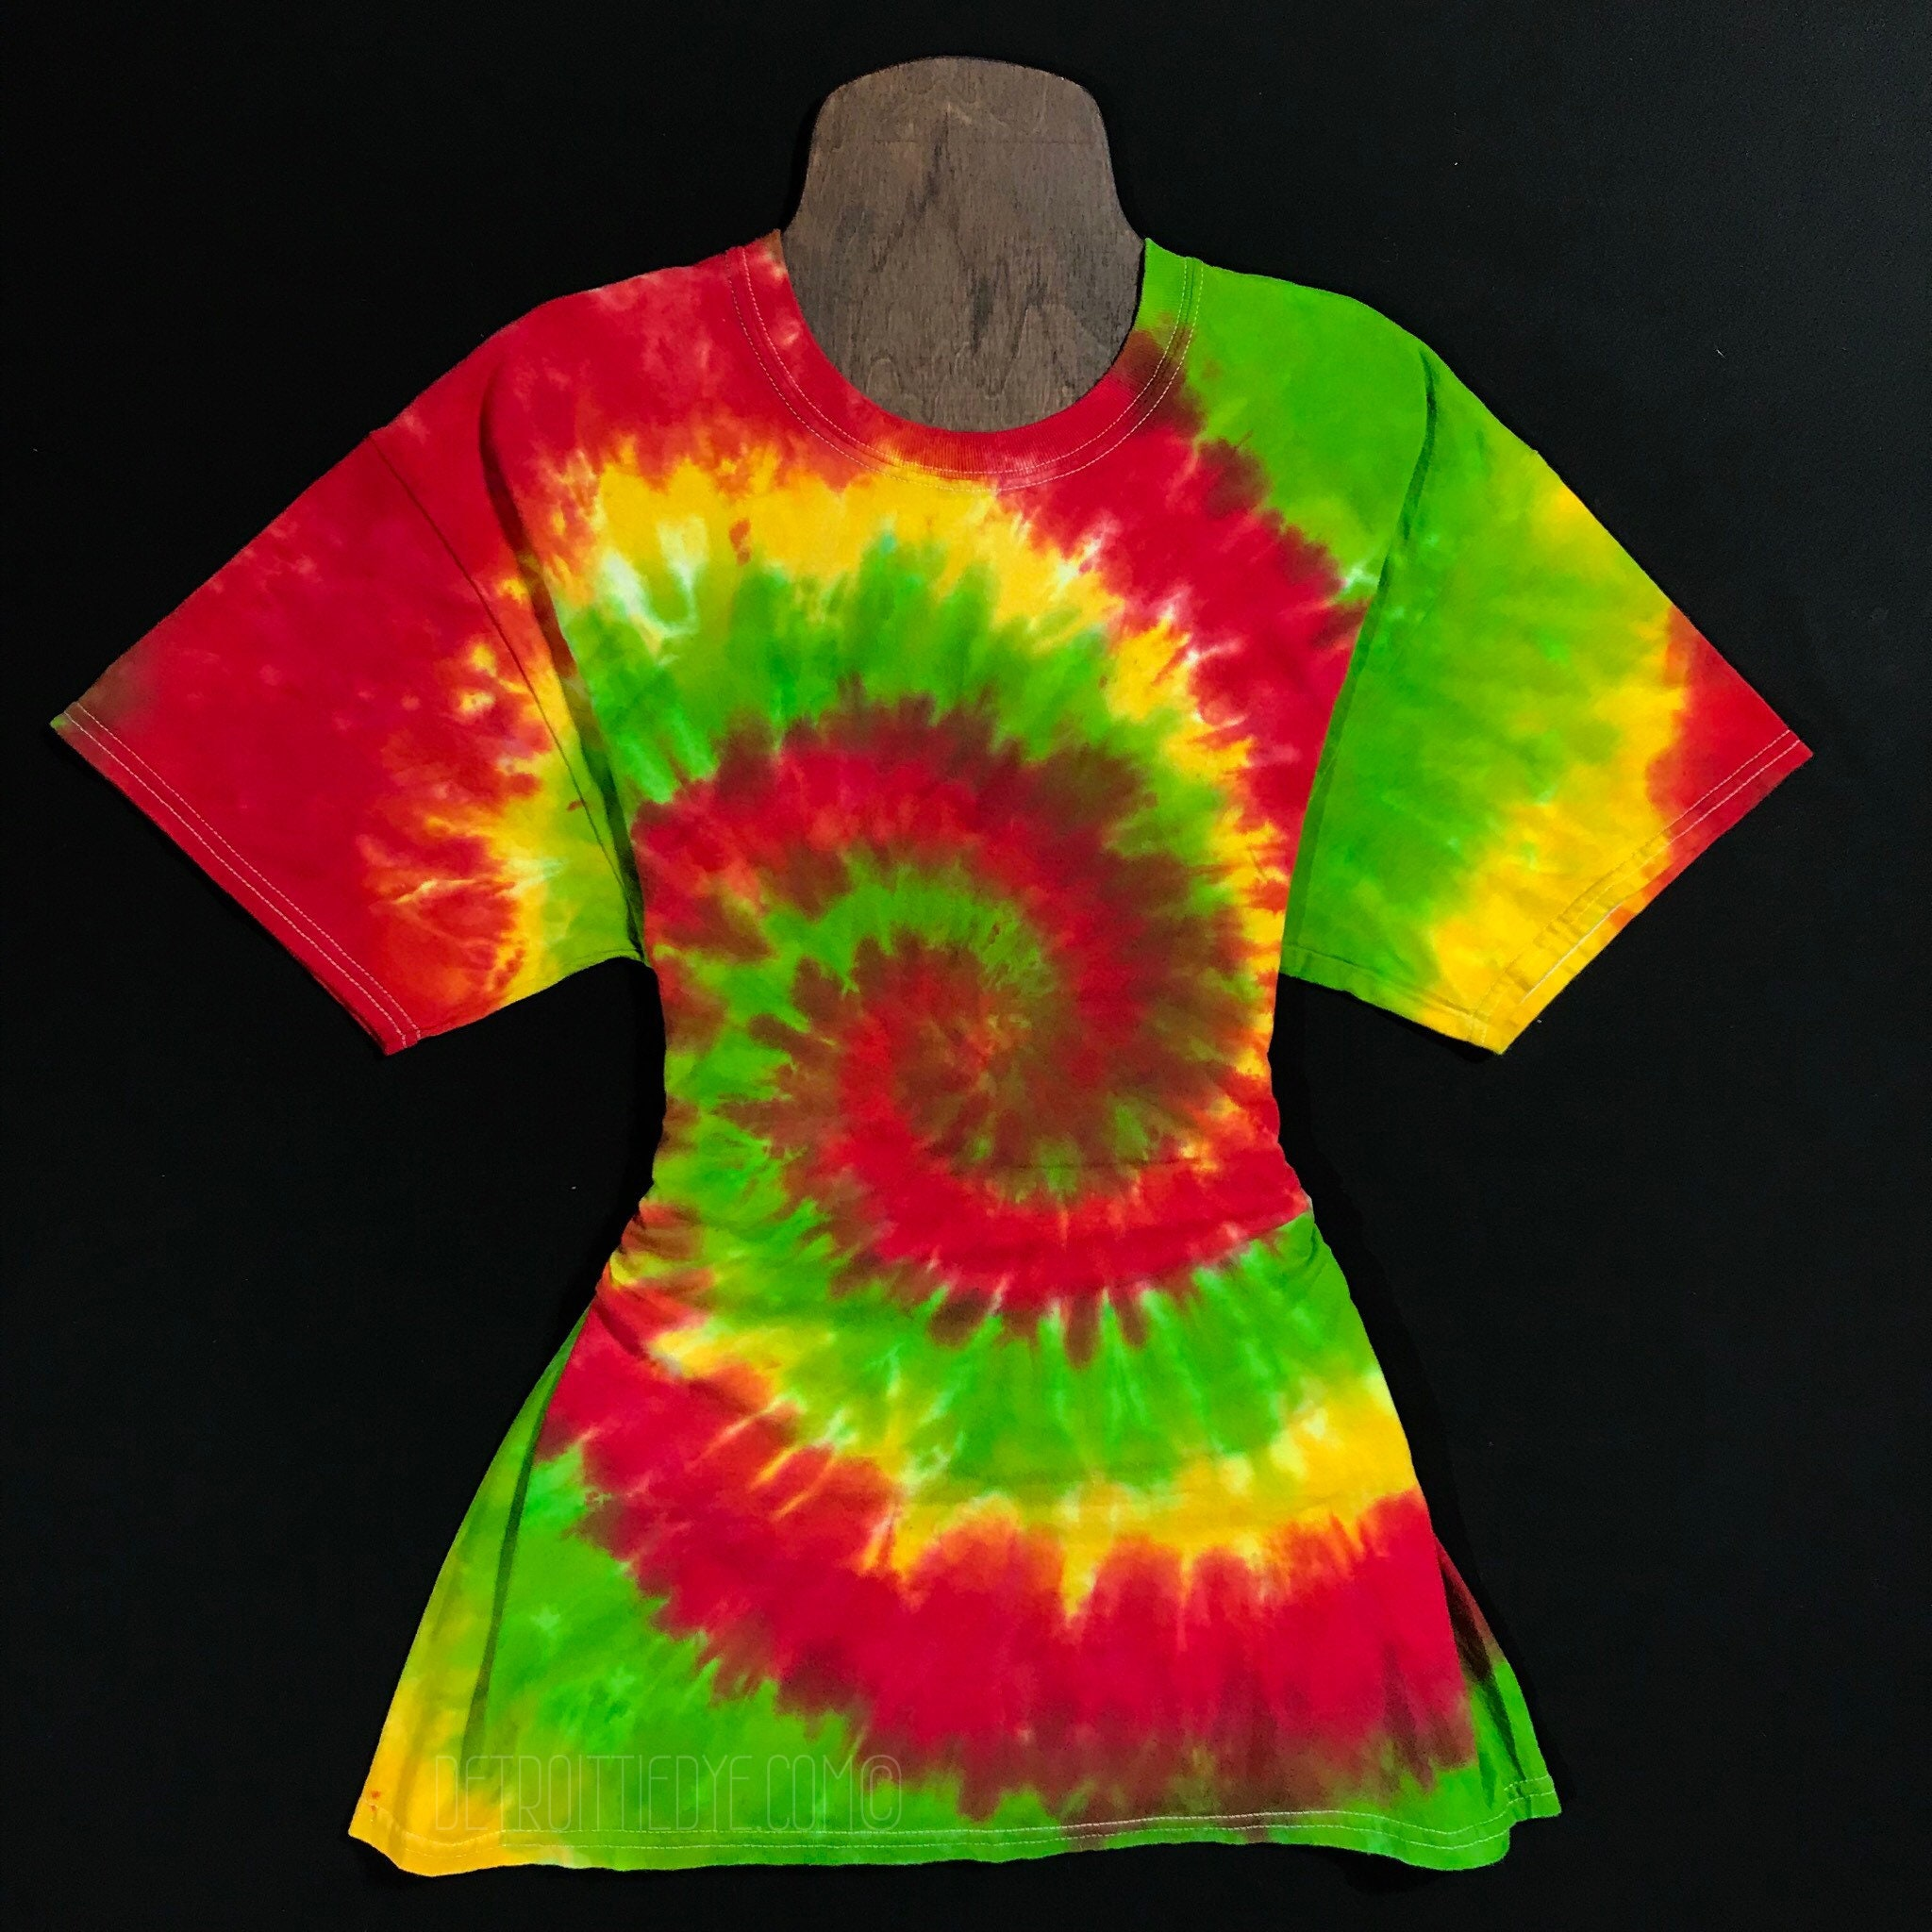 Custom Made Rasta Tie Dye Shirt Tie Dye T Shirt Made To Etsy